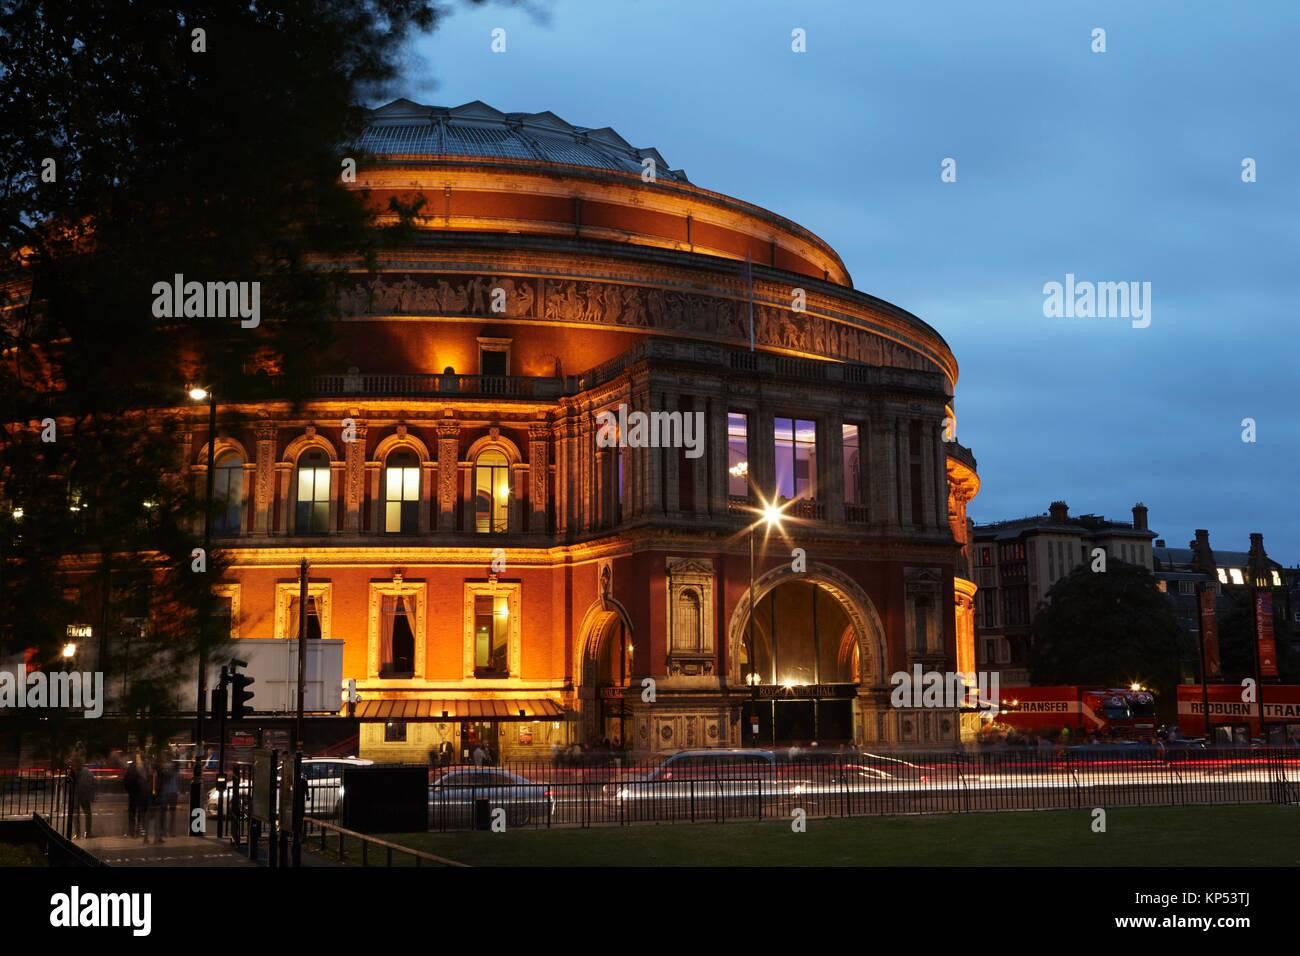 Royal Albert Hall, Londres, Inglaterra, Gran Bretaña; reja Kensington. Imagen De Stock